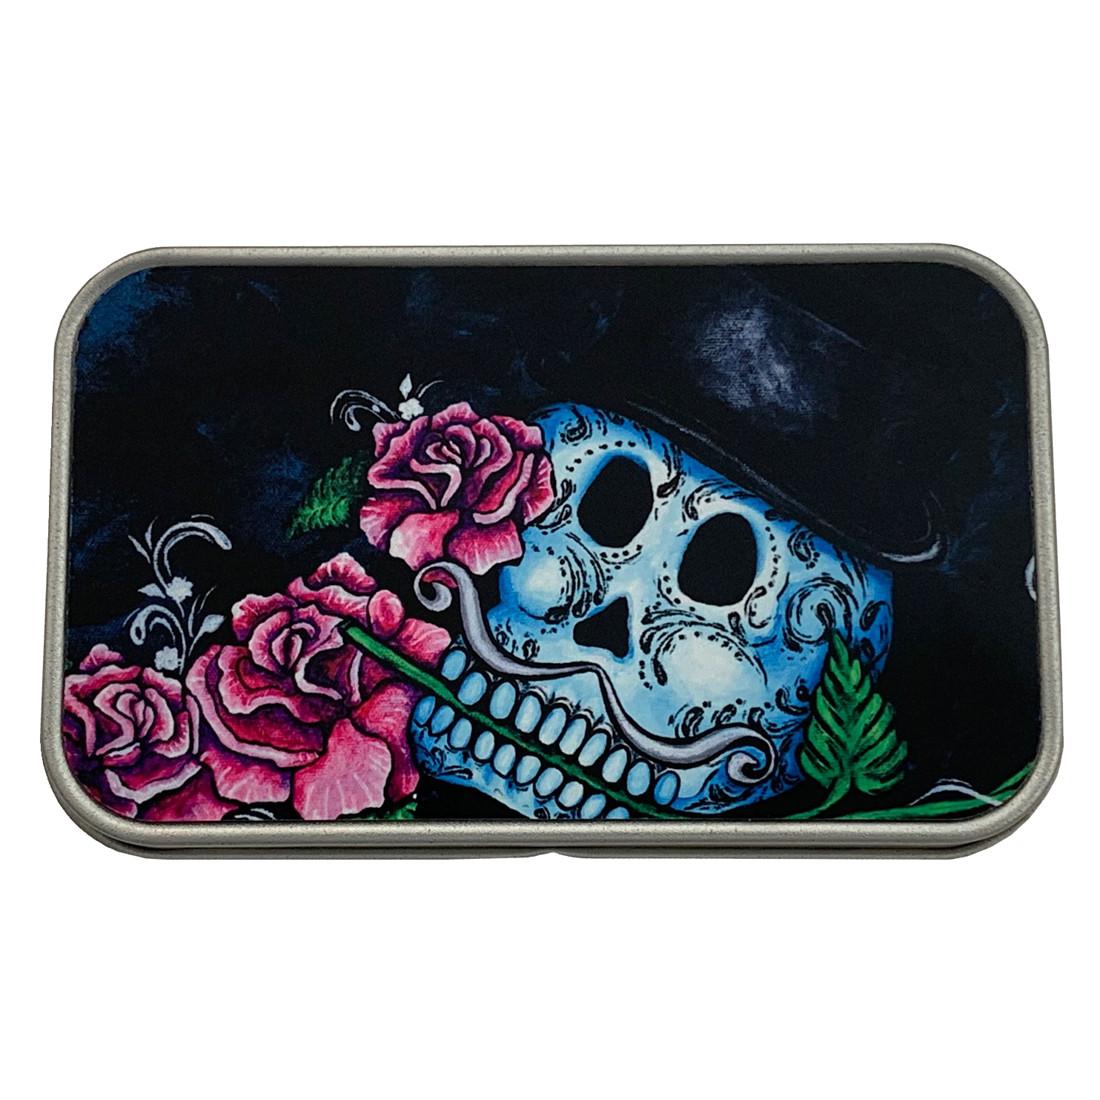 Top Hat Sugar Skull and Roses Rectangle Metal Storage Tin Stash Box